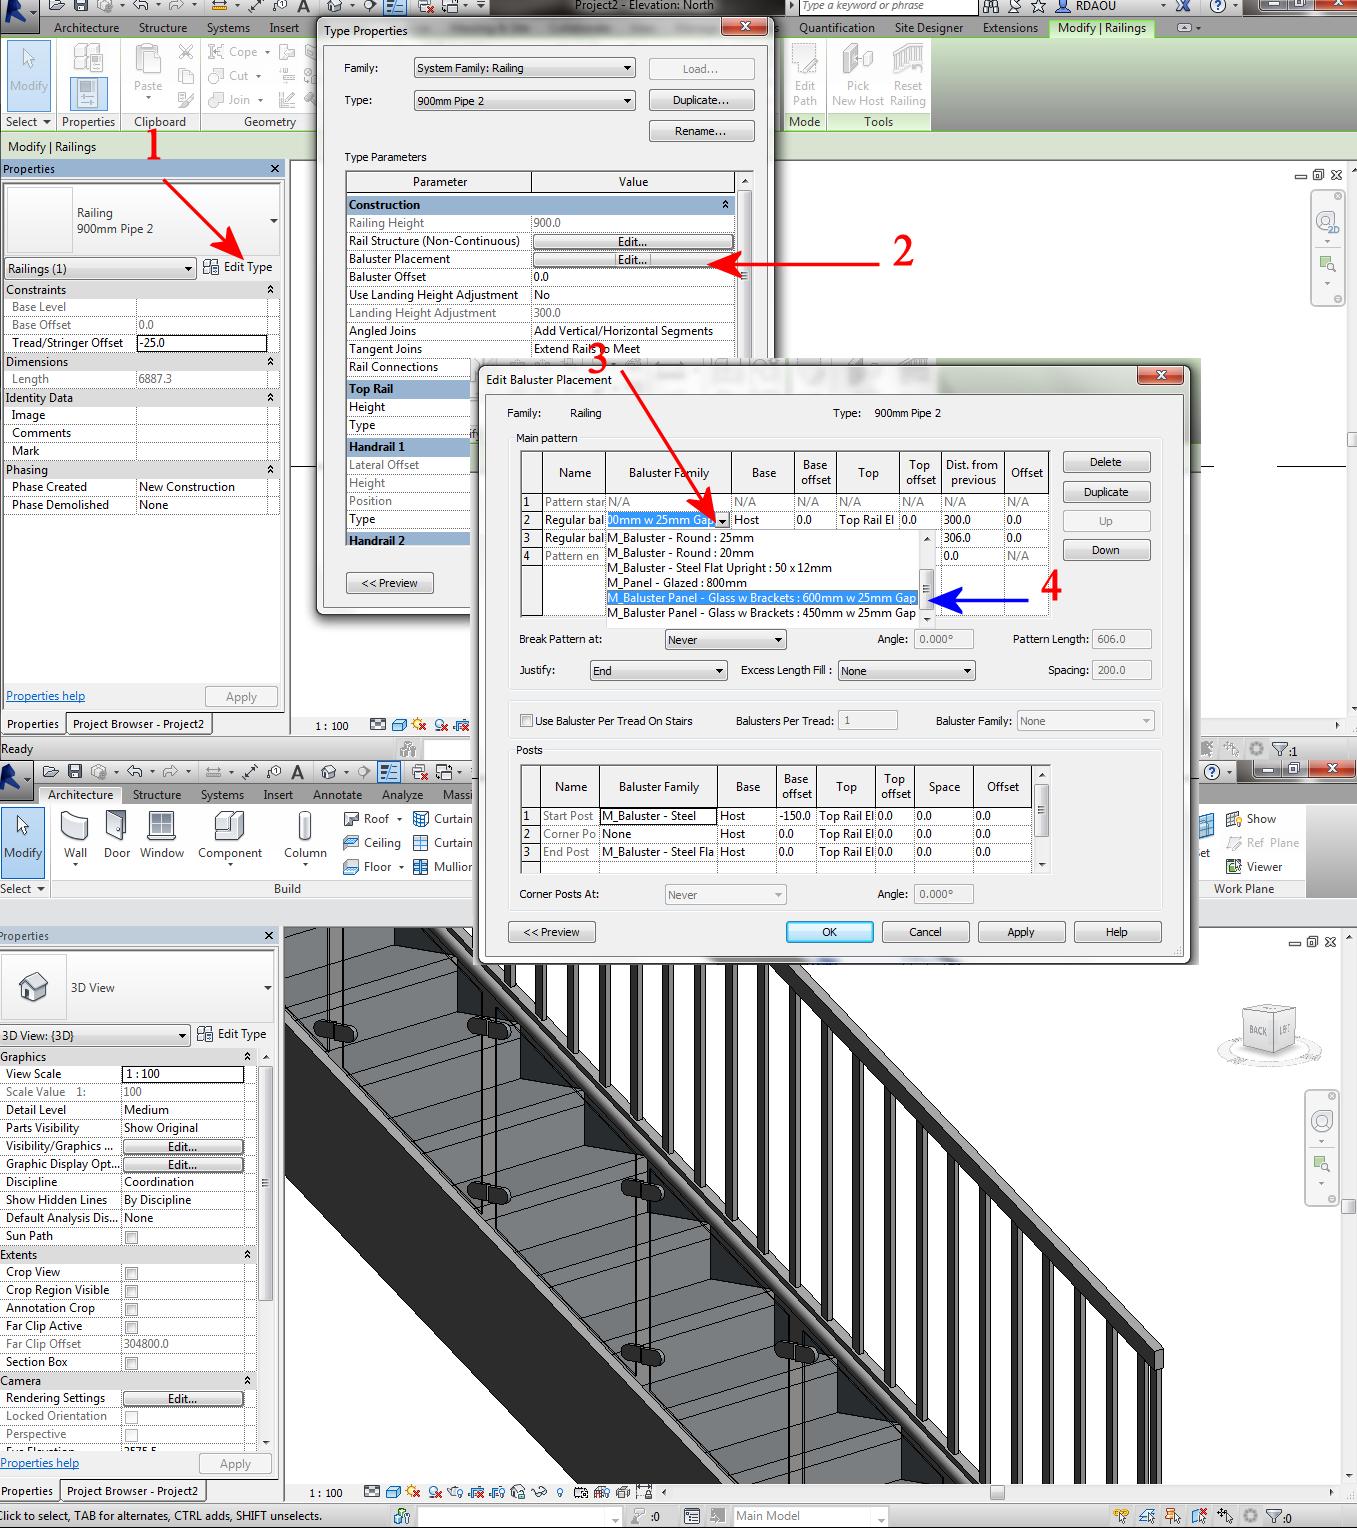 Solved: Loading Railing Family - Autodesk Community